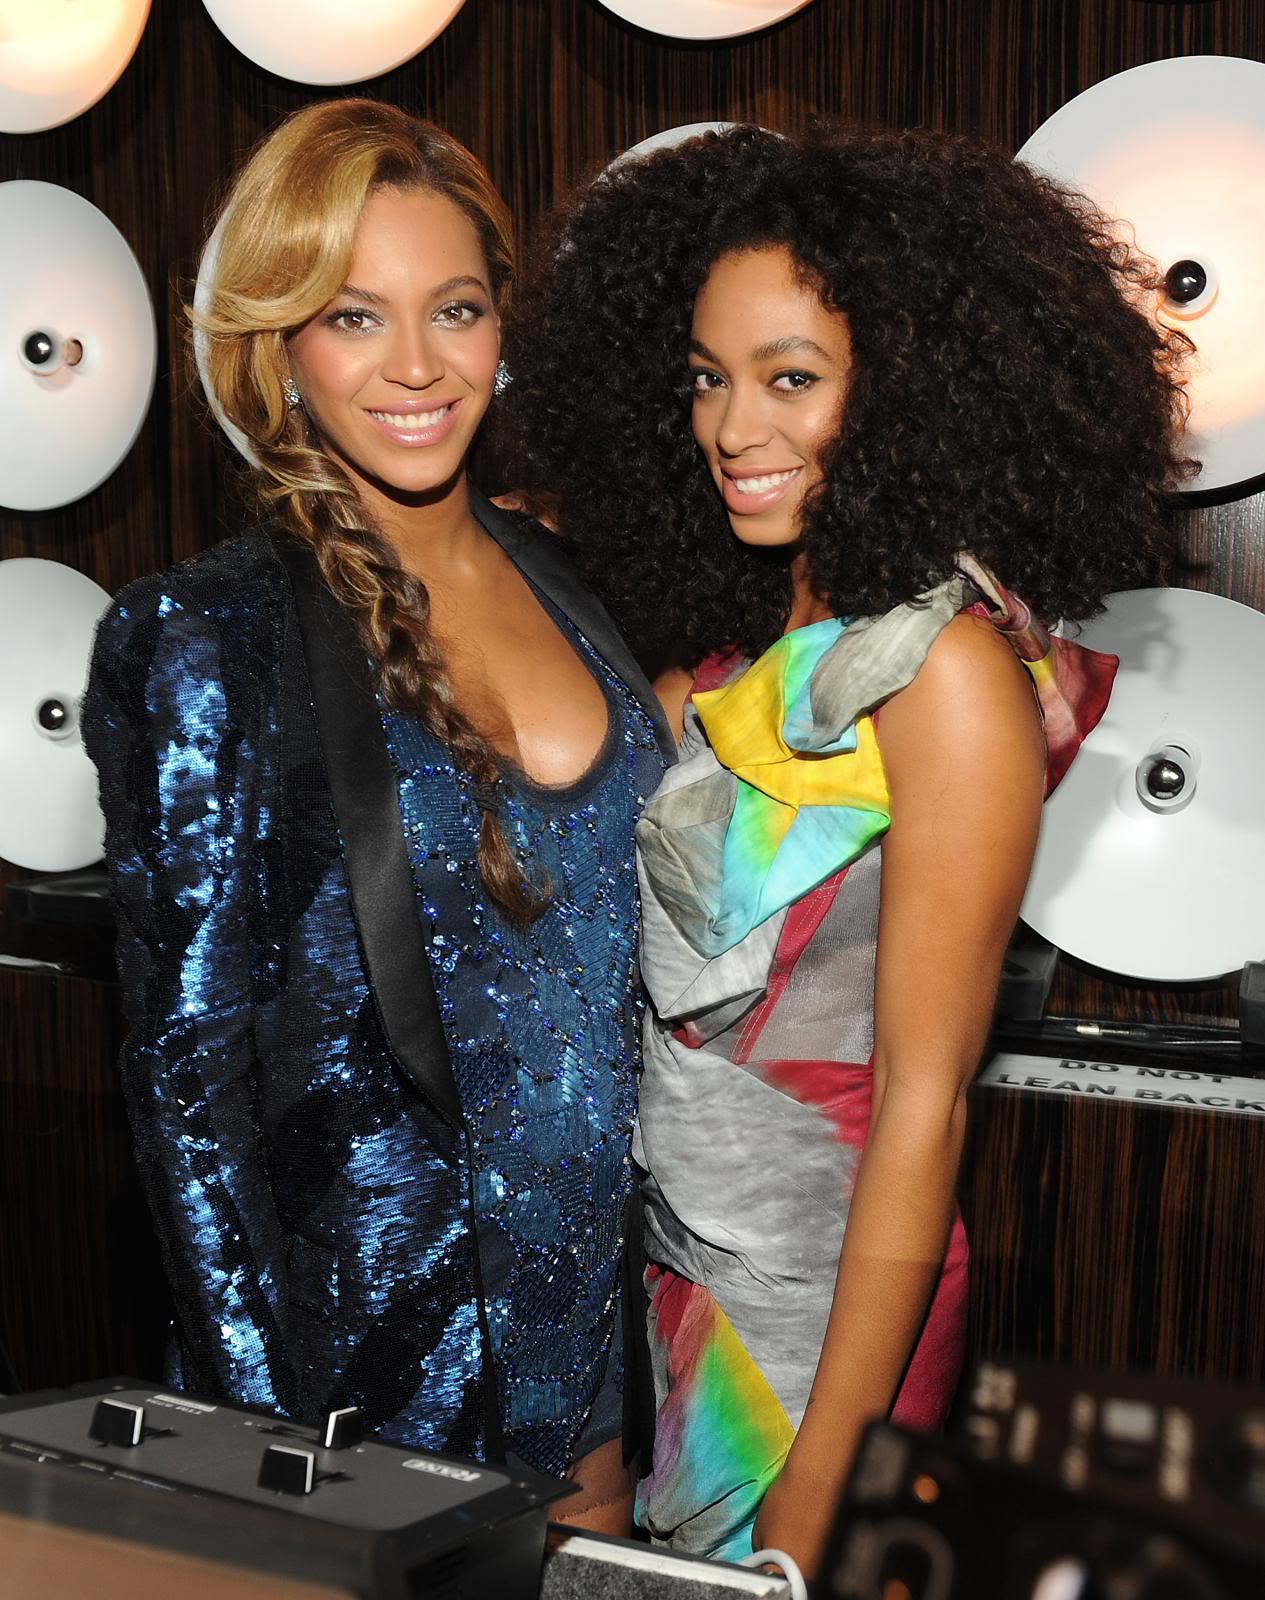 Beyoncé > Fragancias 'Heat'/'Pulse'/'Rise' (#1 Selling Celebrity Fragrance Line) - Página 4 PG2_2542